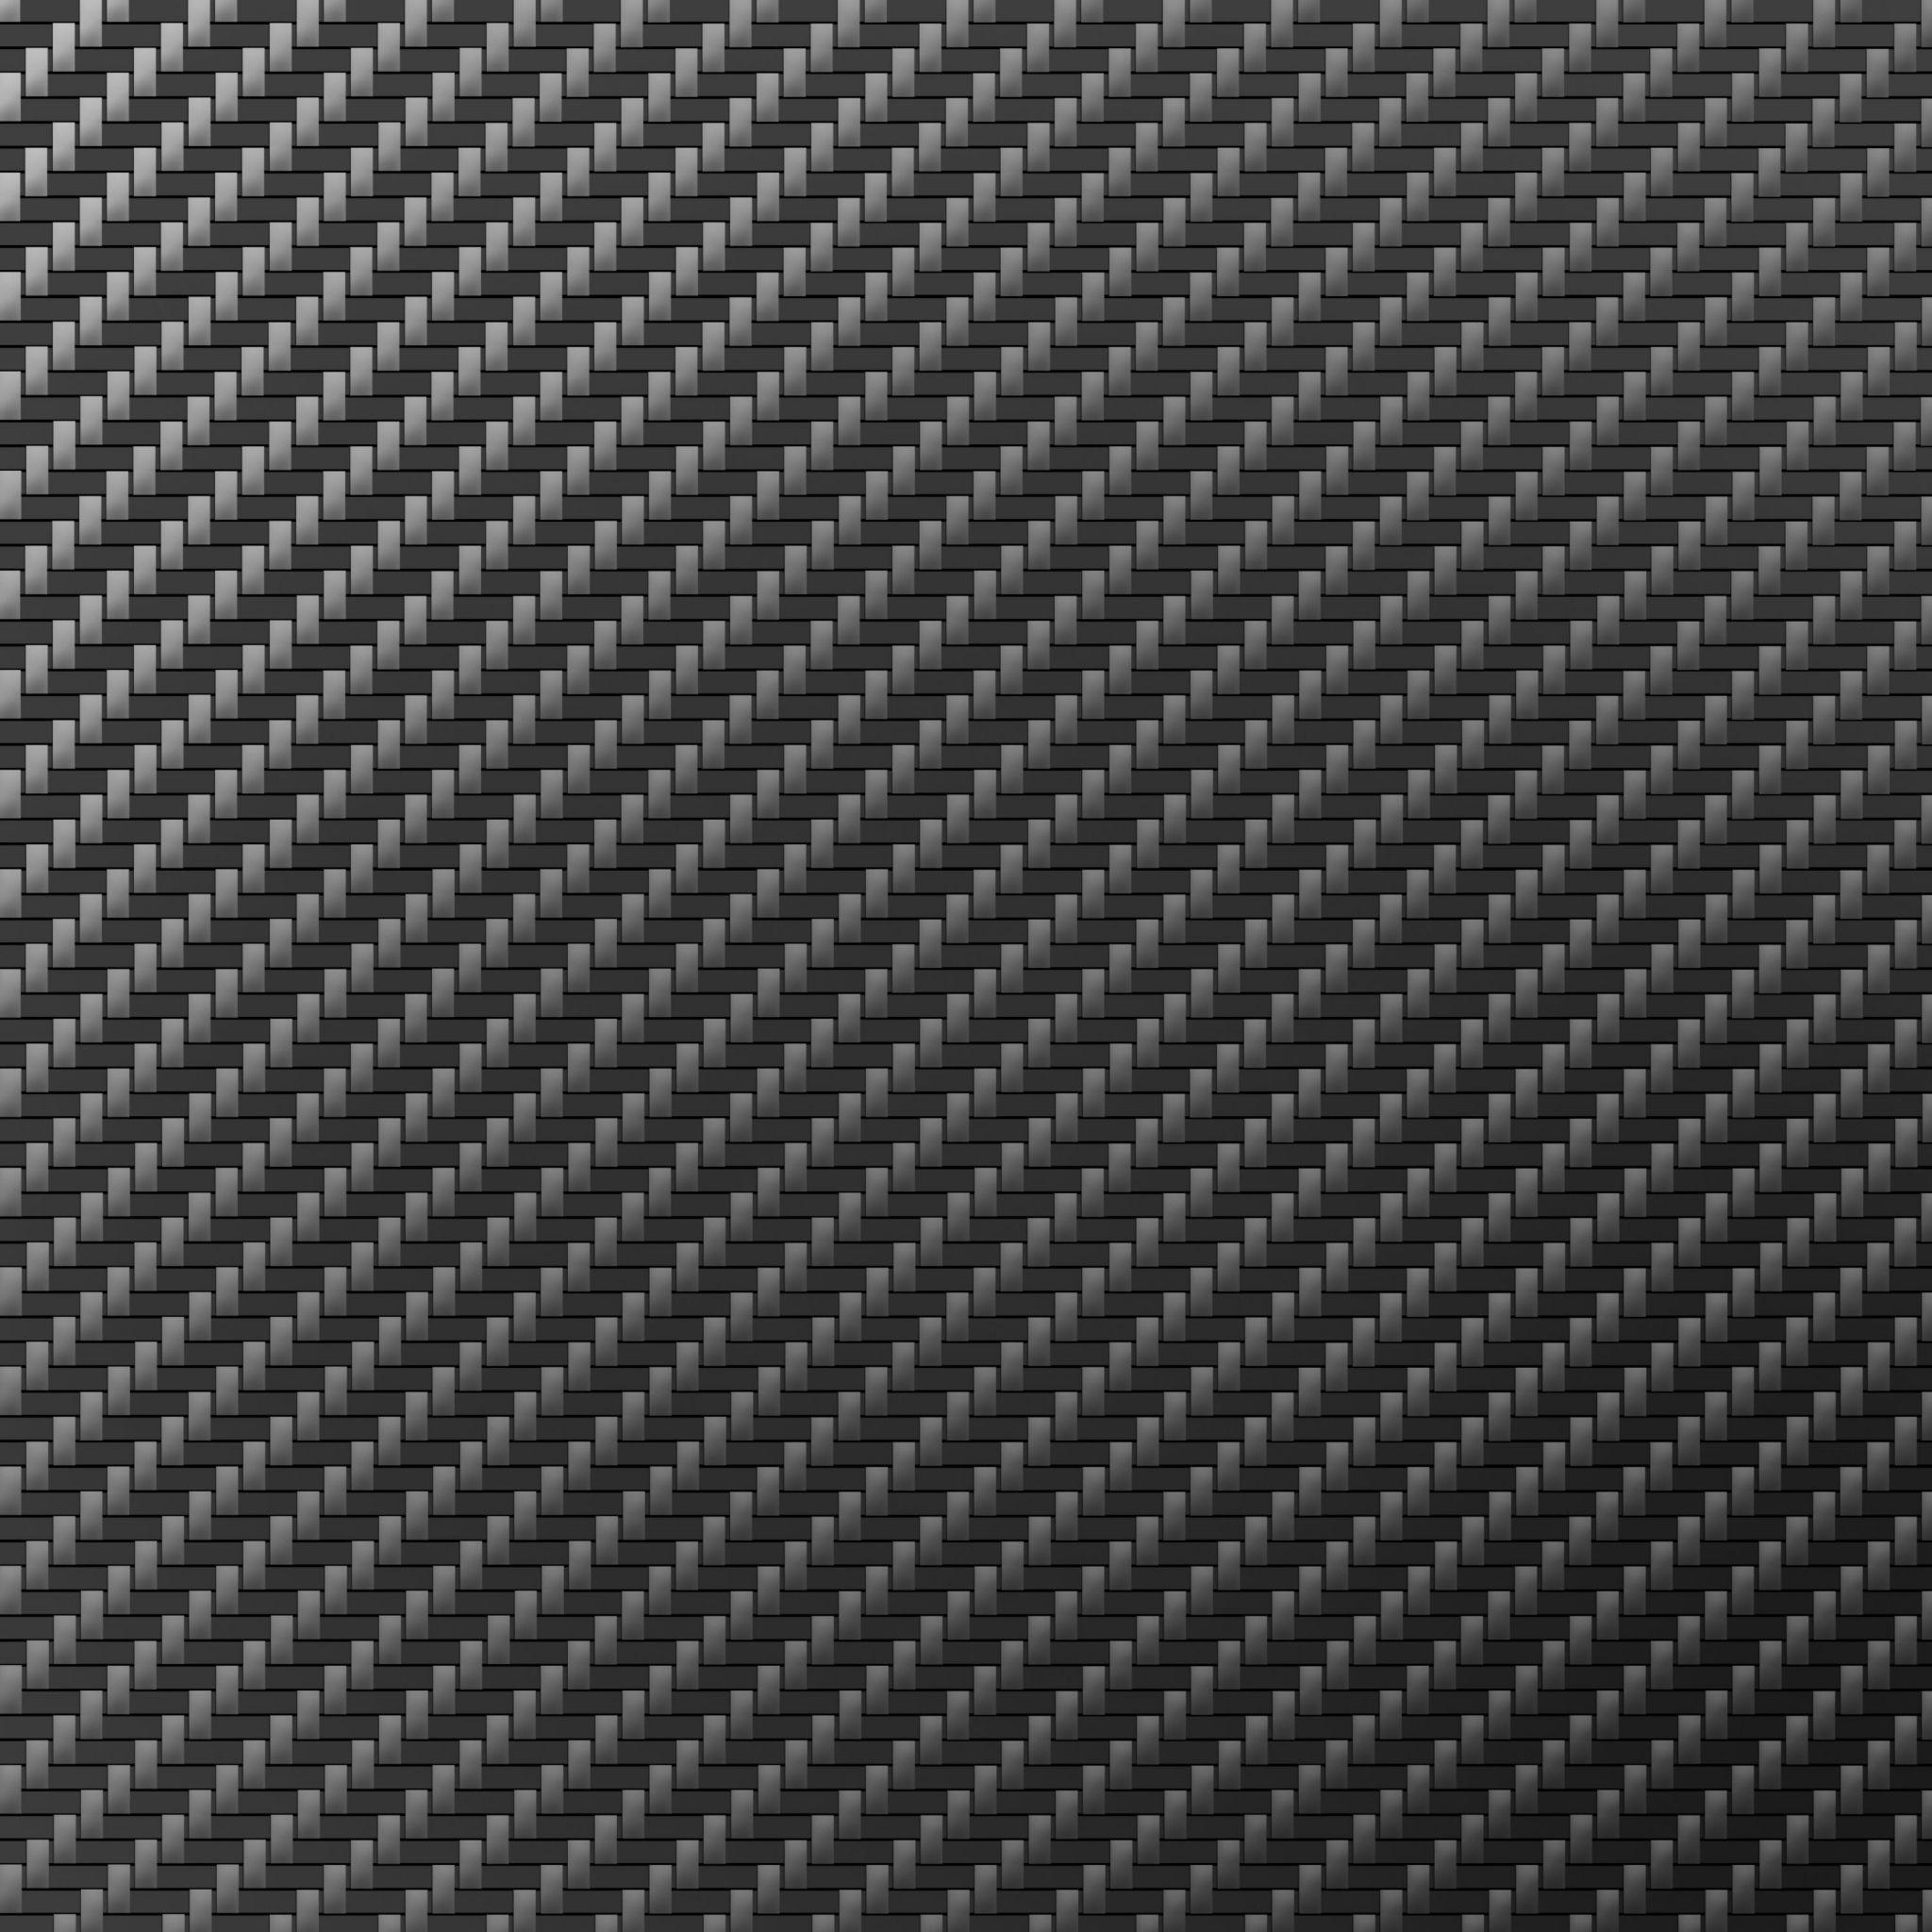 Carbon Fiber Free Backgrounds Desktop Carbon Fiber Wallpaper Phone Wallpaper Design Fabric Texture Pattern